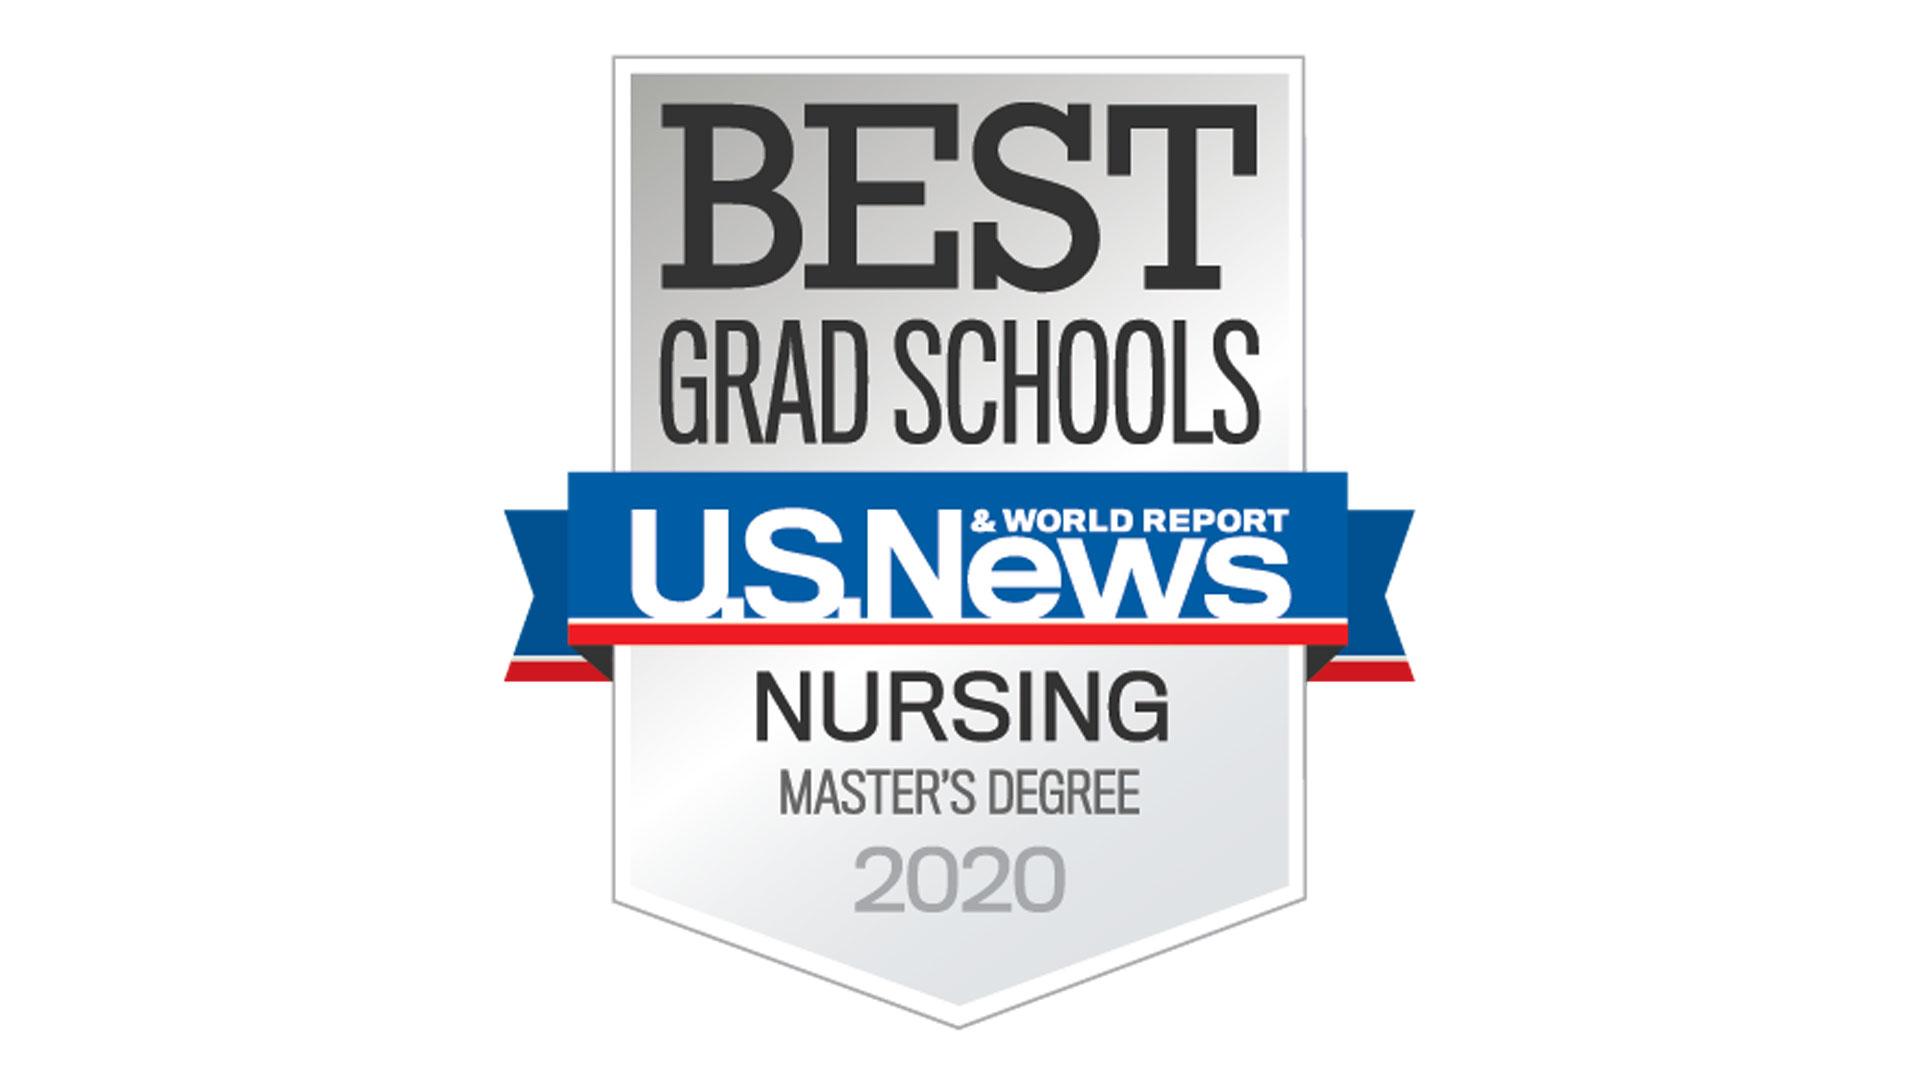 University of Virginia School of Nursing